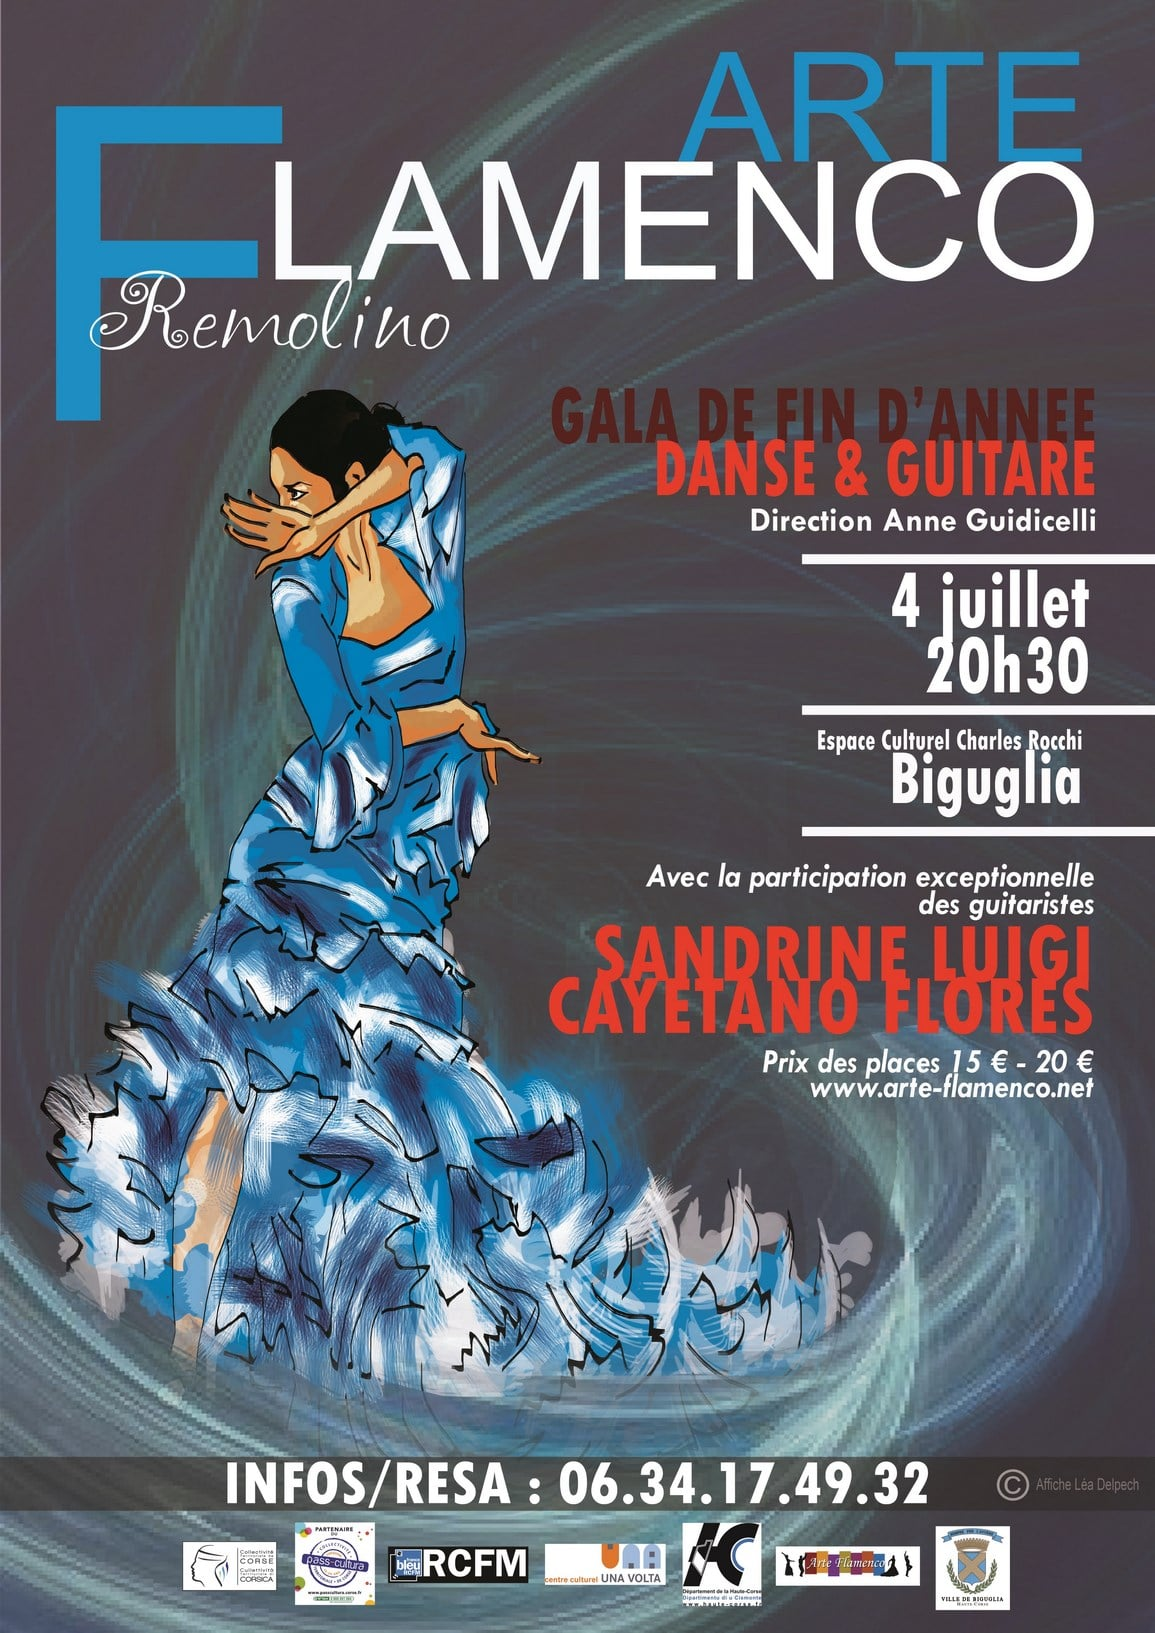 Expositions, et spectacle Flamenco Danse et Guitare : REMOLINO